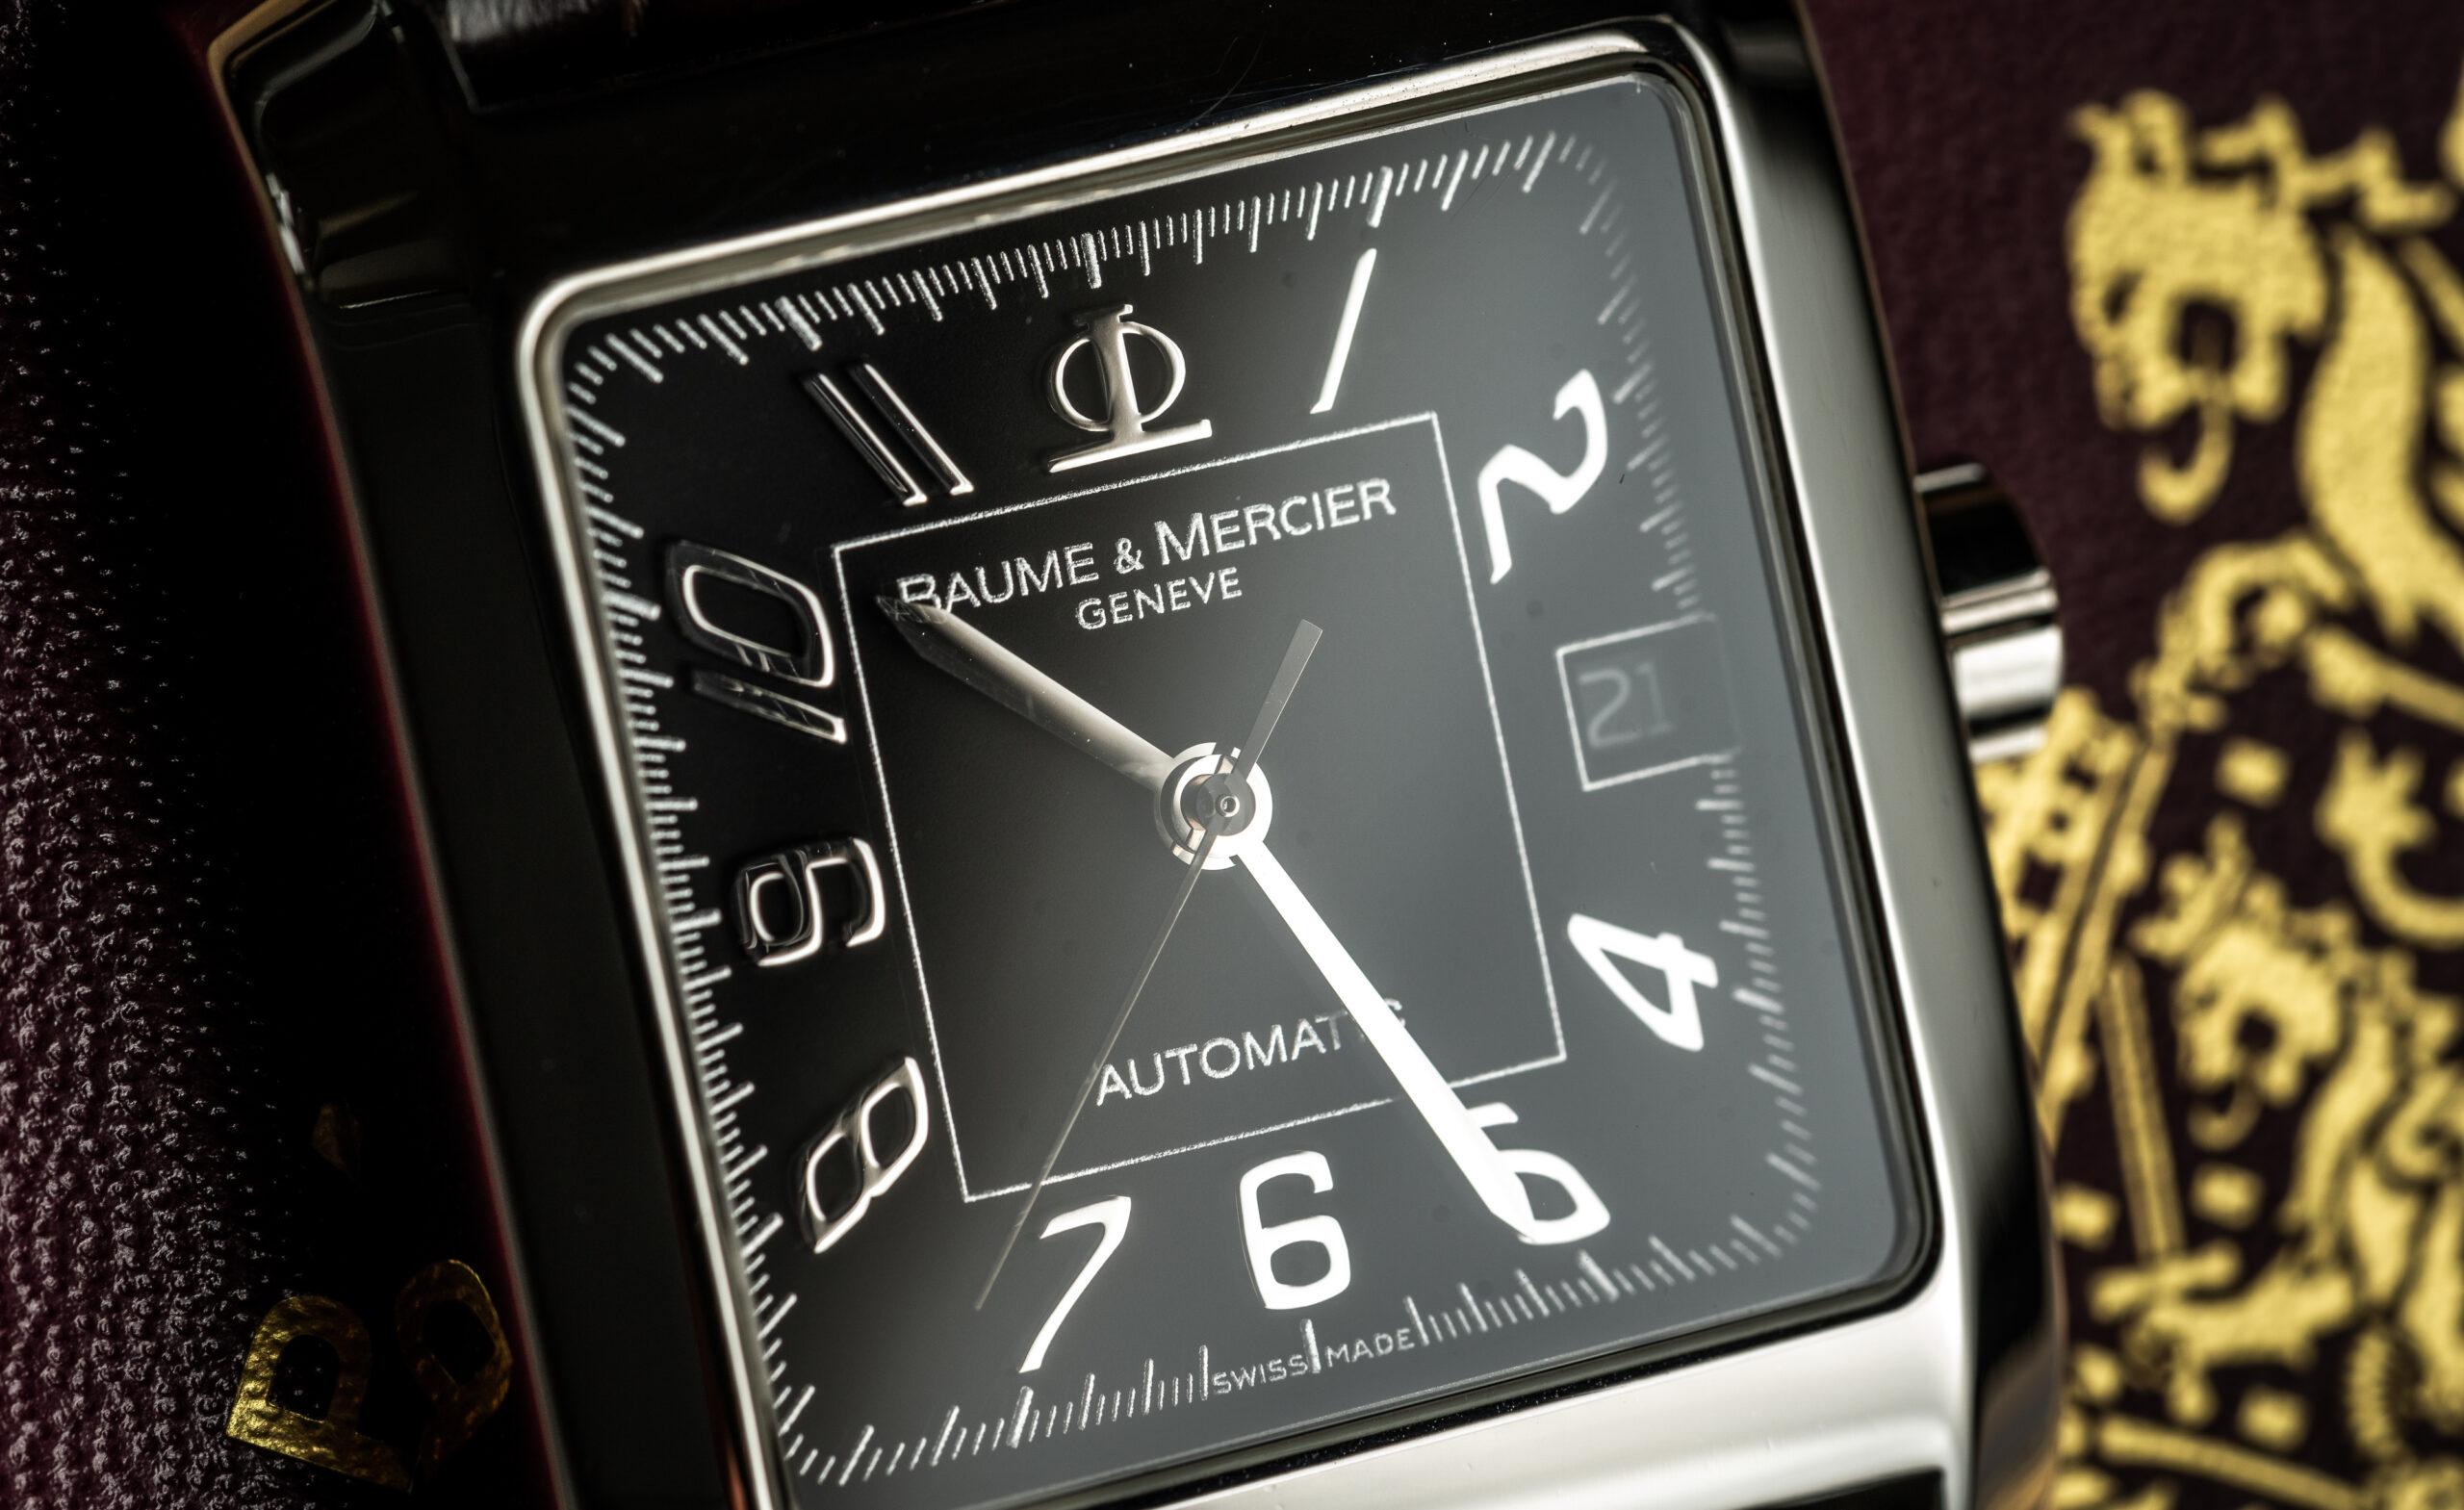 Baume et mercier hampton xl 65532 watch dial